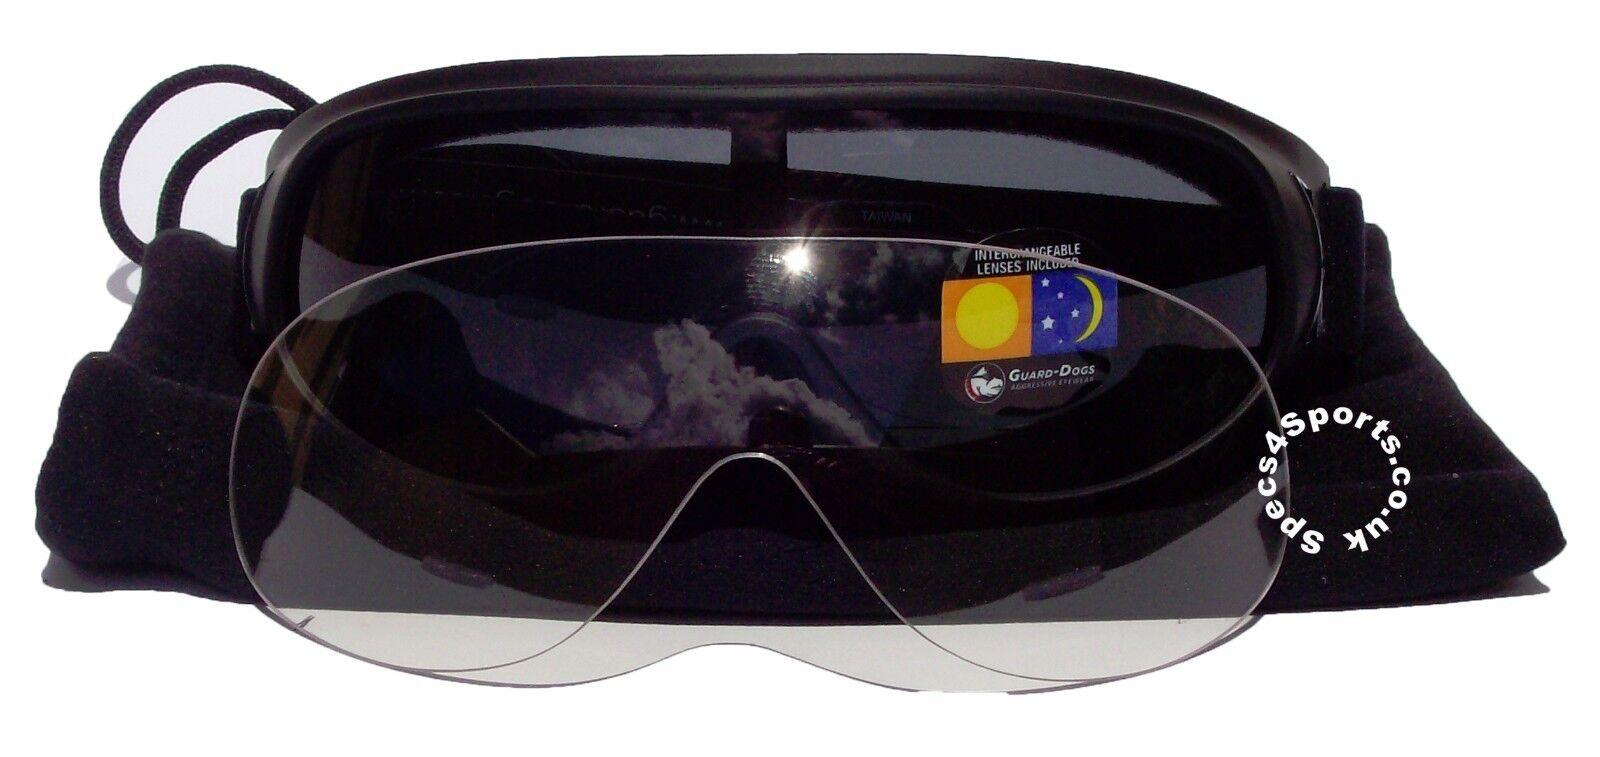 COMMANDER 1 Airsoft Goggles | | | FogStopper™ Coating + Indestructo Frame 4fb34f